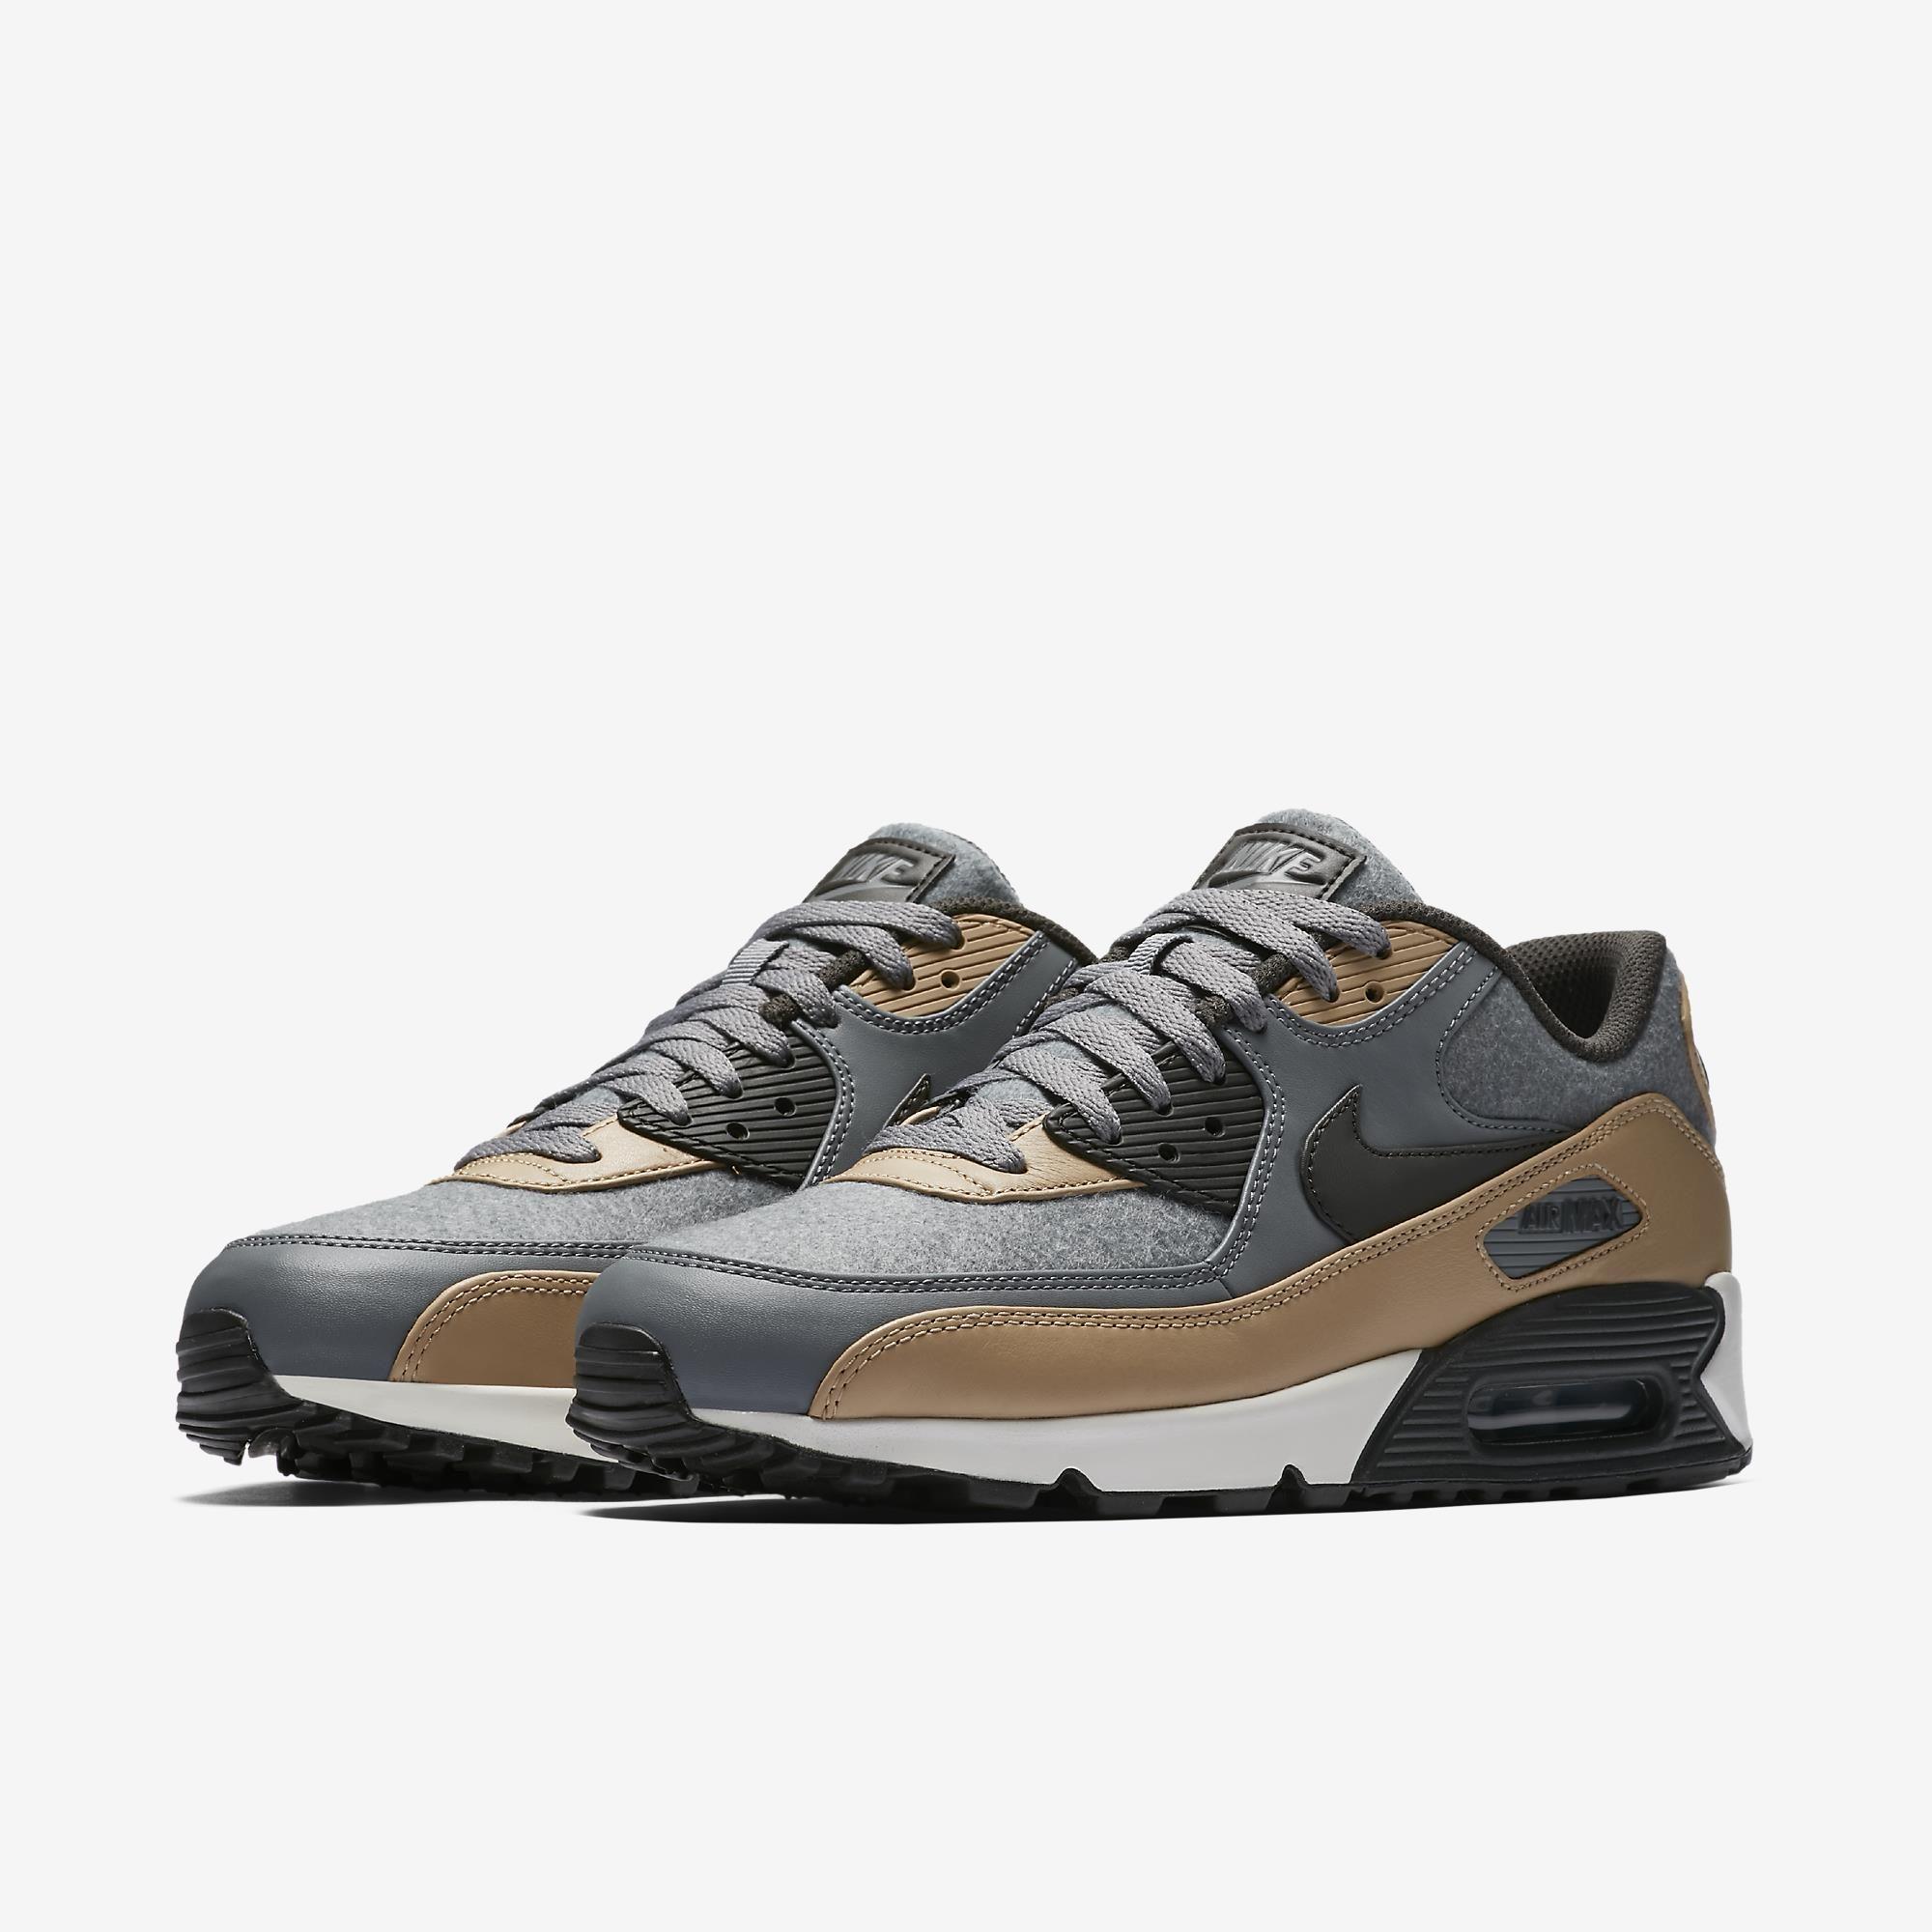 f93482744 Tênis Nike Air Max 90 Premium Masculino | must have | Sneakers nike ...